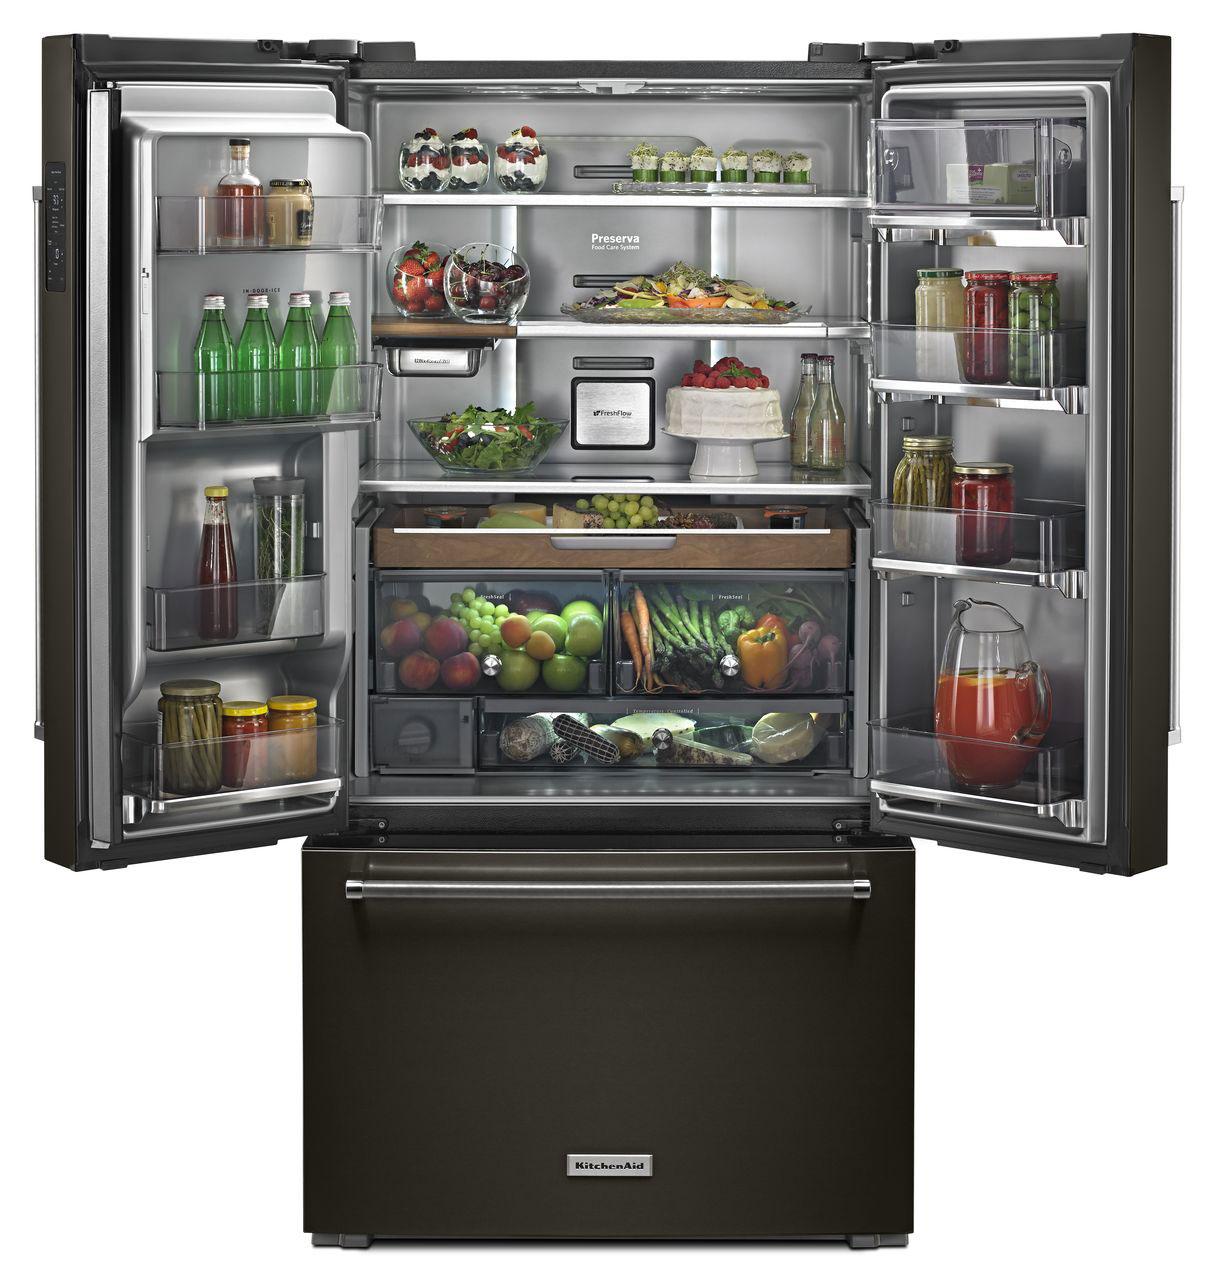 Kitchenaid Refrigerator Black Stainless kitchenaid stainless french door refrigerator krfc704fbs